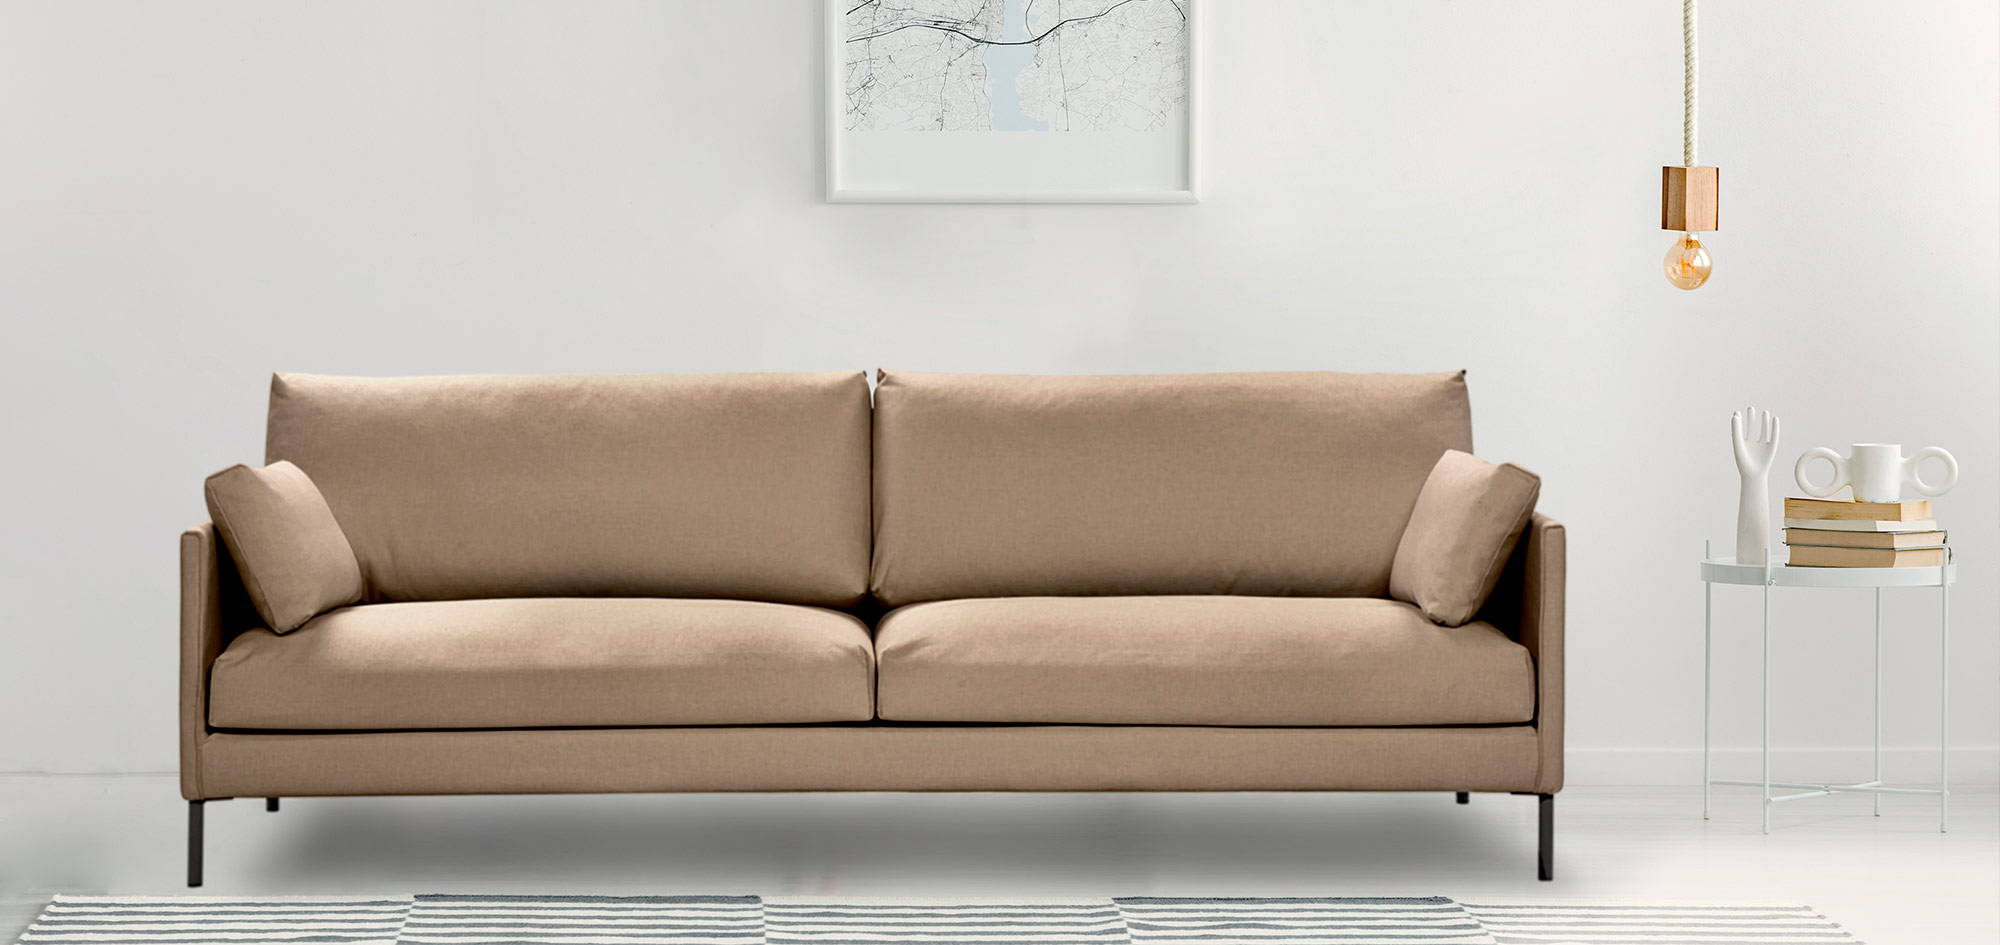 Nordic-sohva, beige kangas. HT Collection